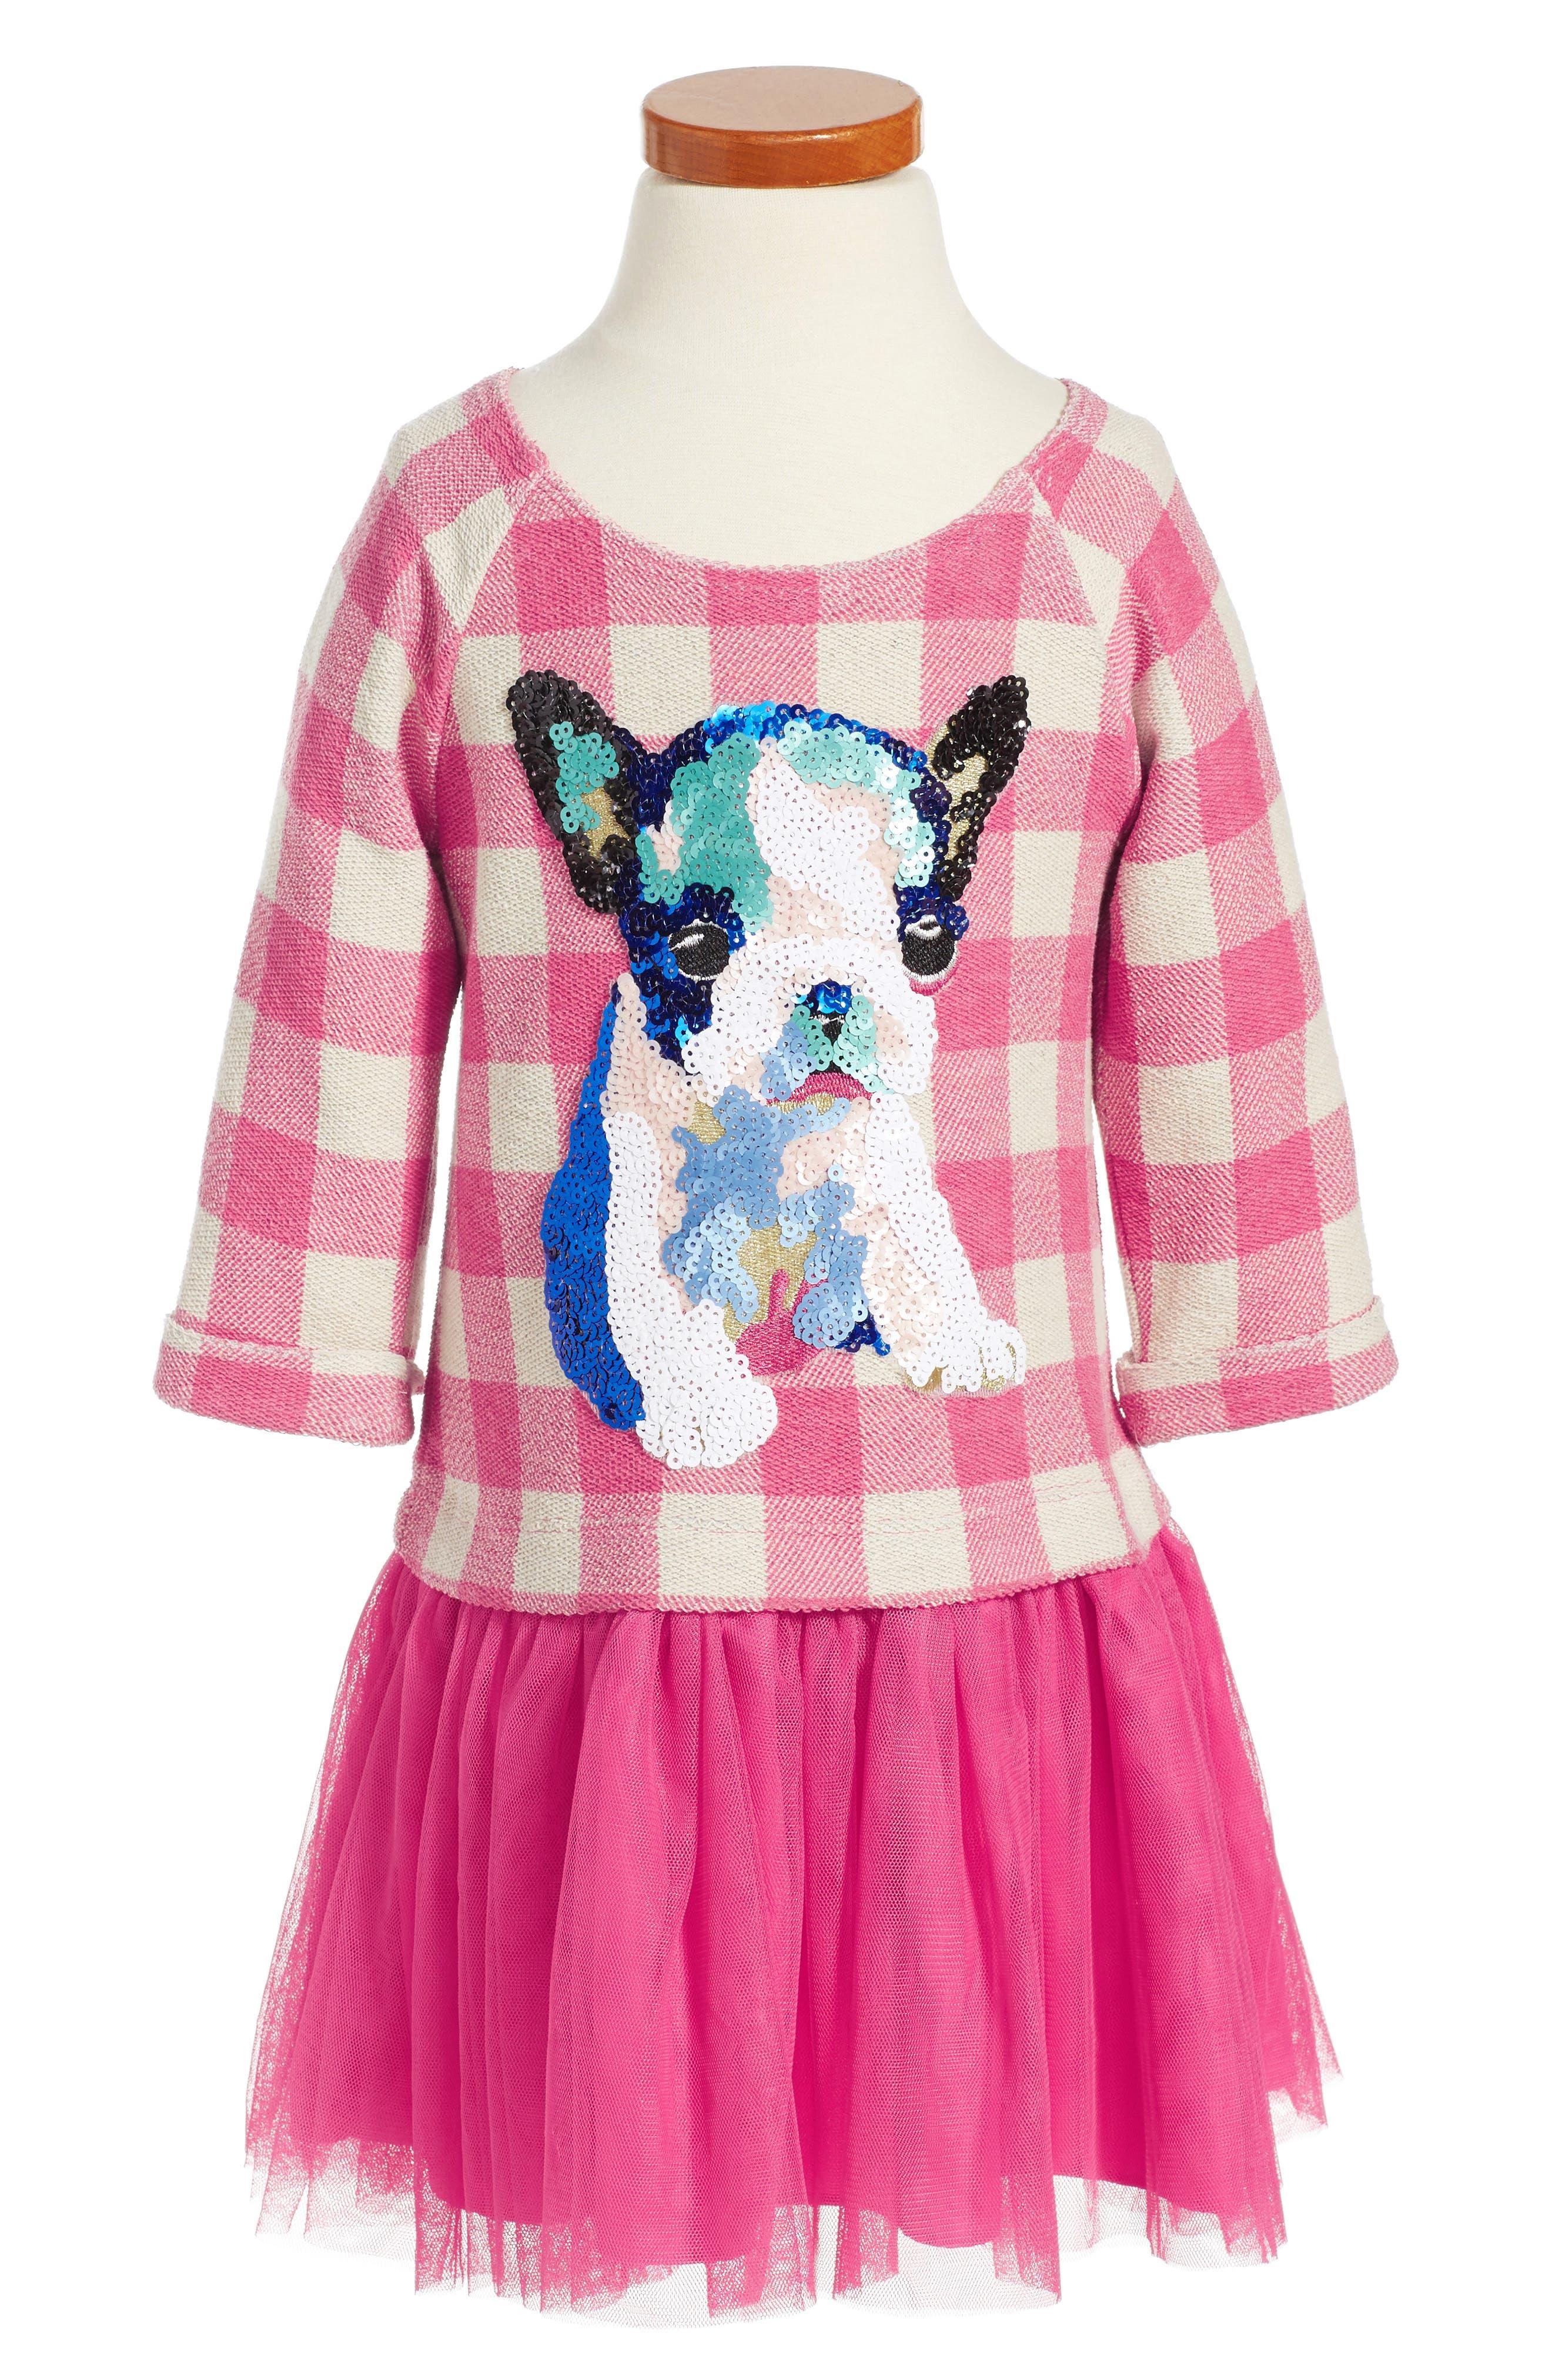 PIPPA & JULIE French Bulldog Embellished Dress